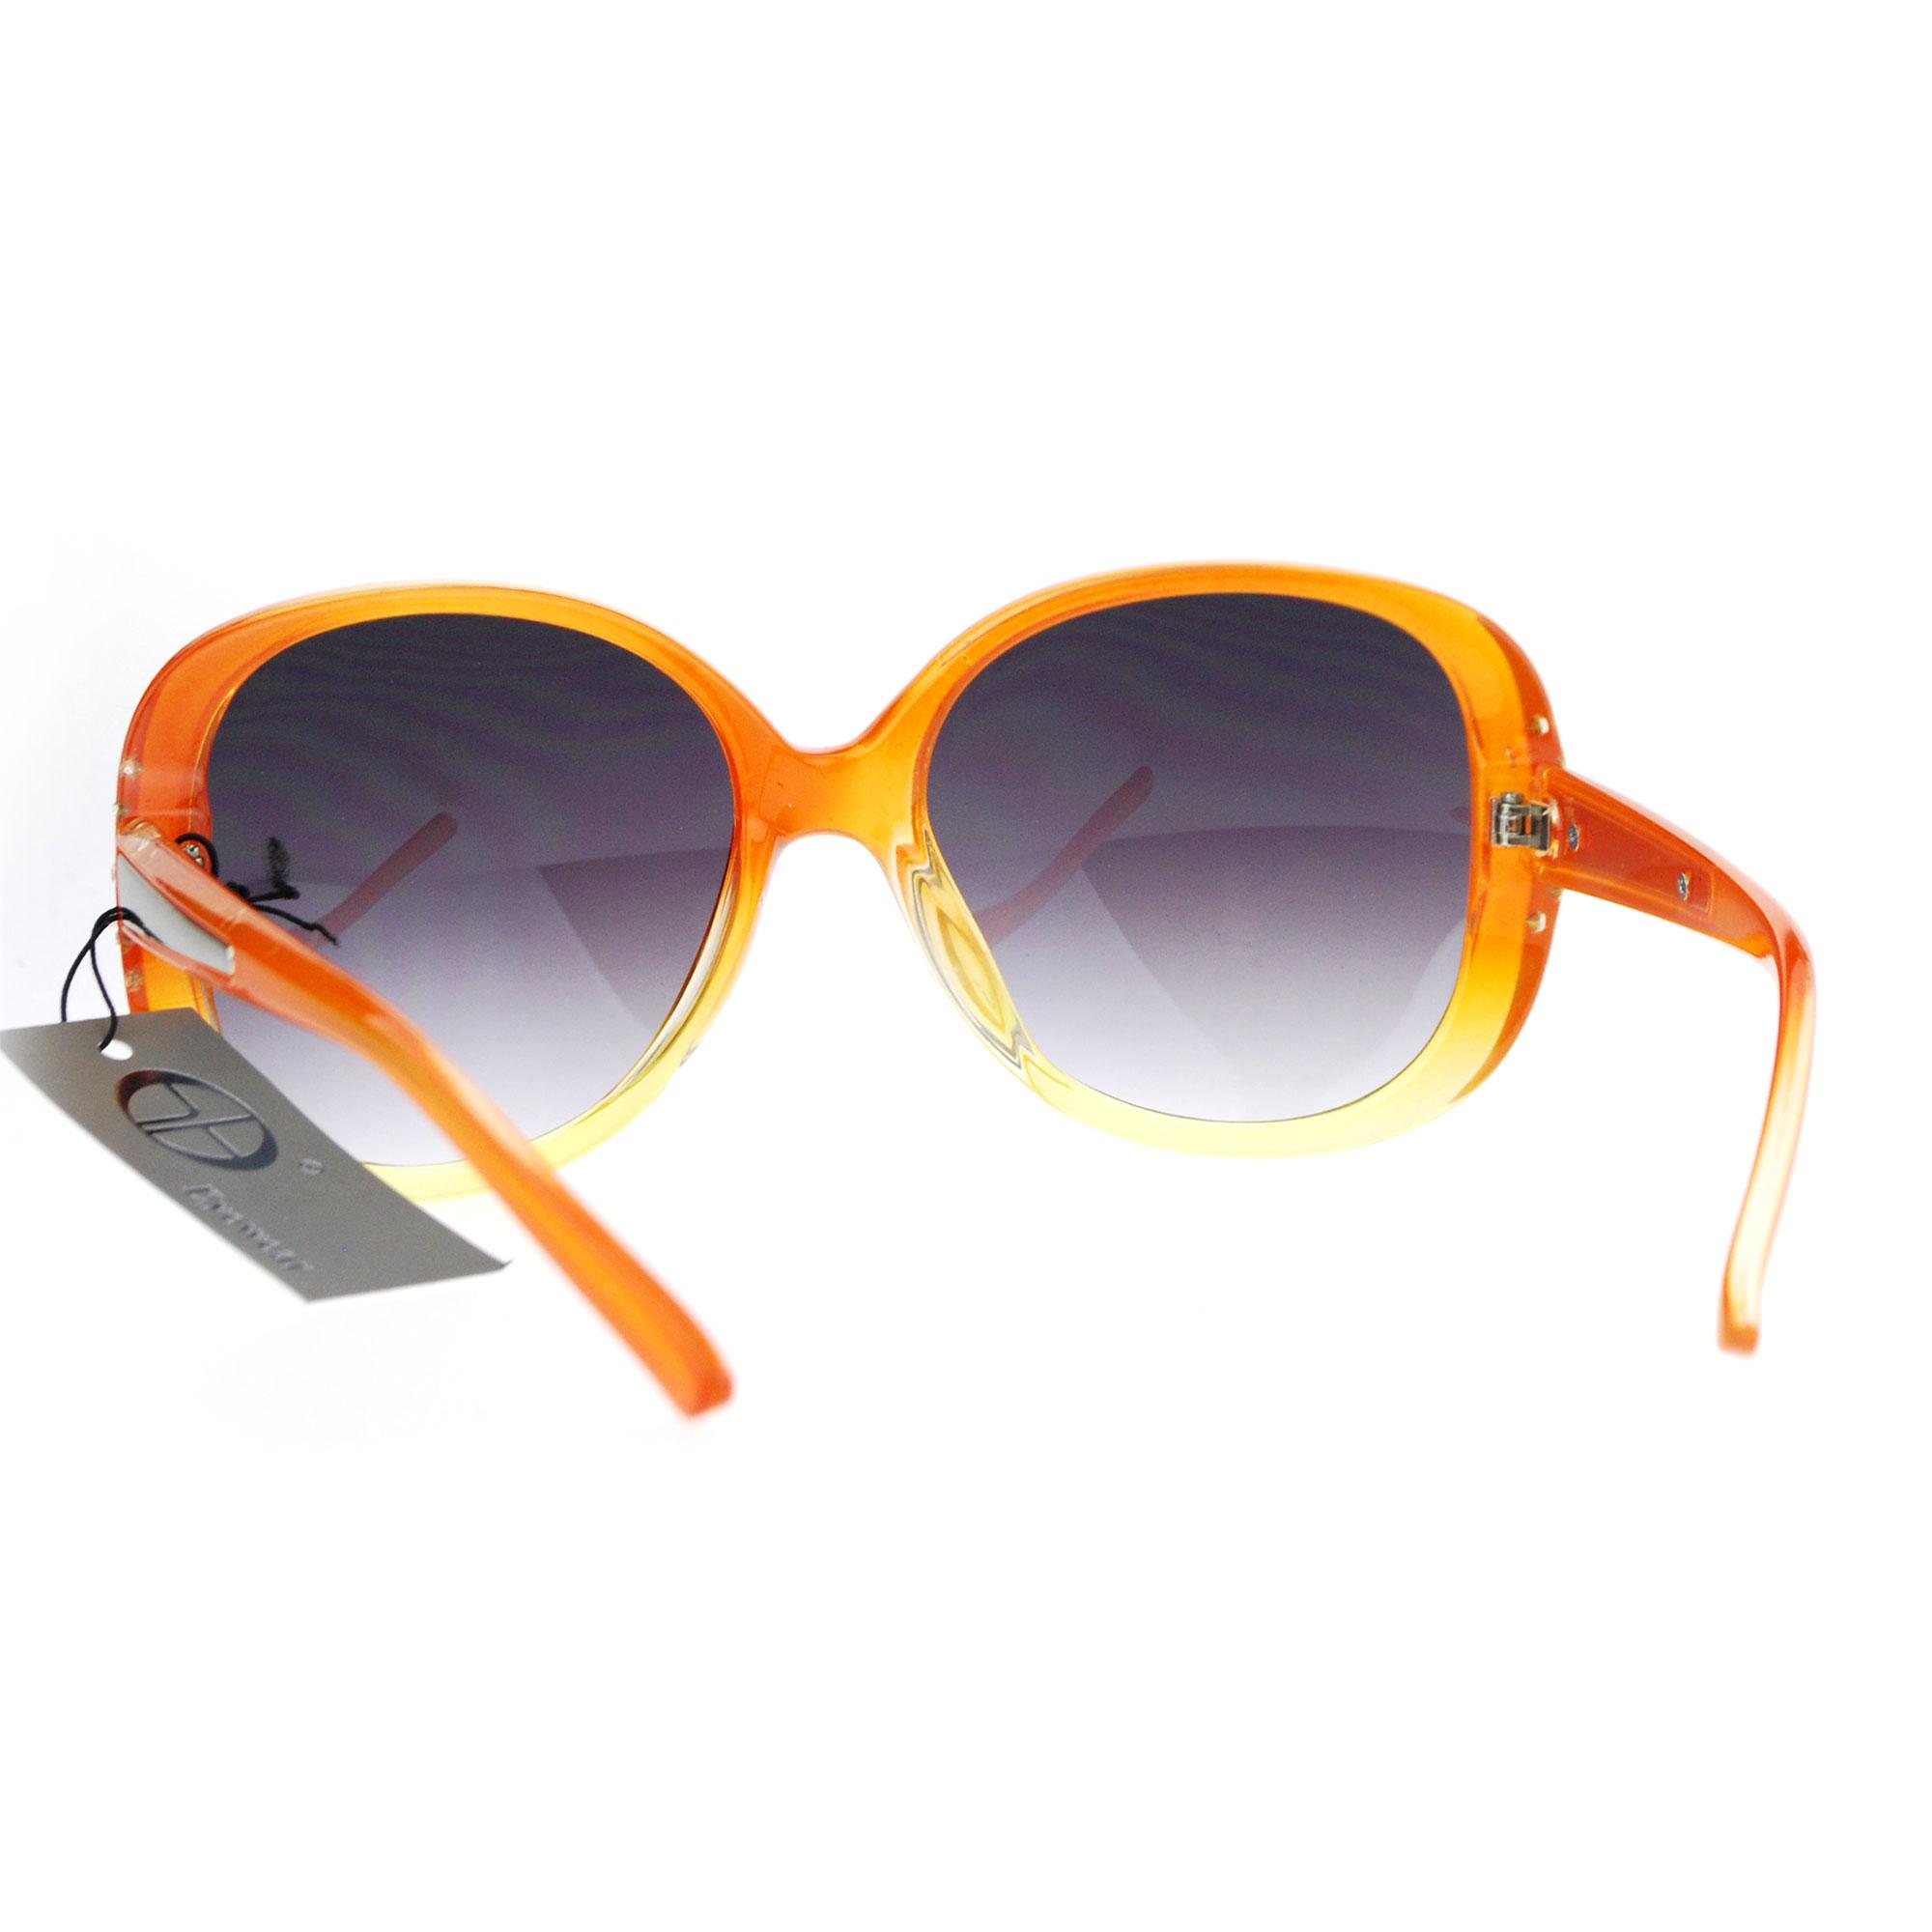 SA106 Womens Rhinestone Studded Oversize Fashion Plastic Butterfly Sunglasses